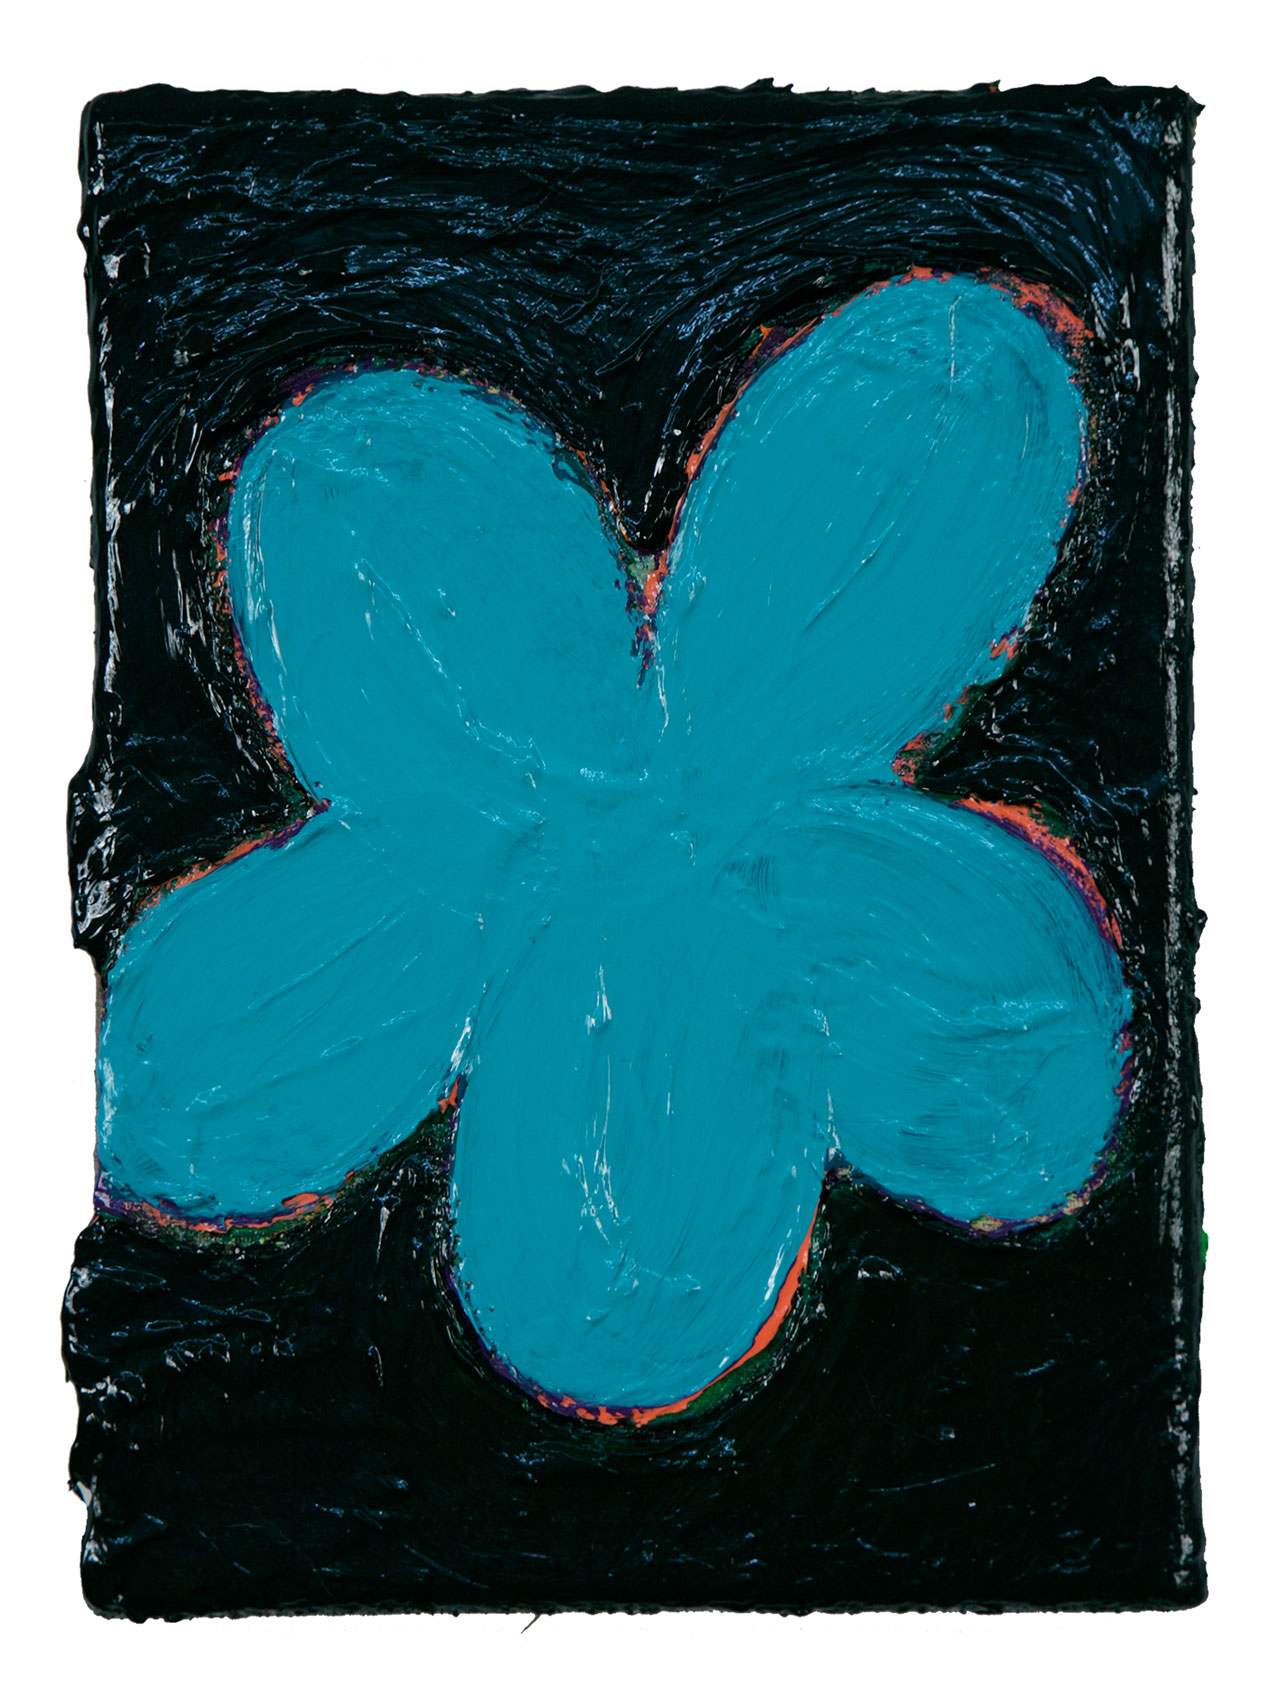 25 Flowers 5 | 2008 © Kerstin Jeckel | MEMORY-PROJEKT # extra